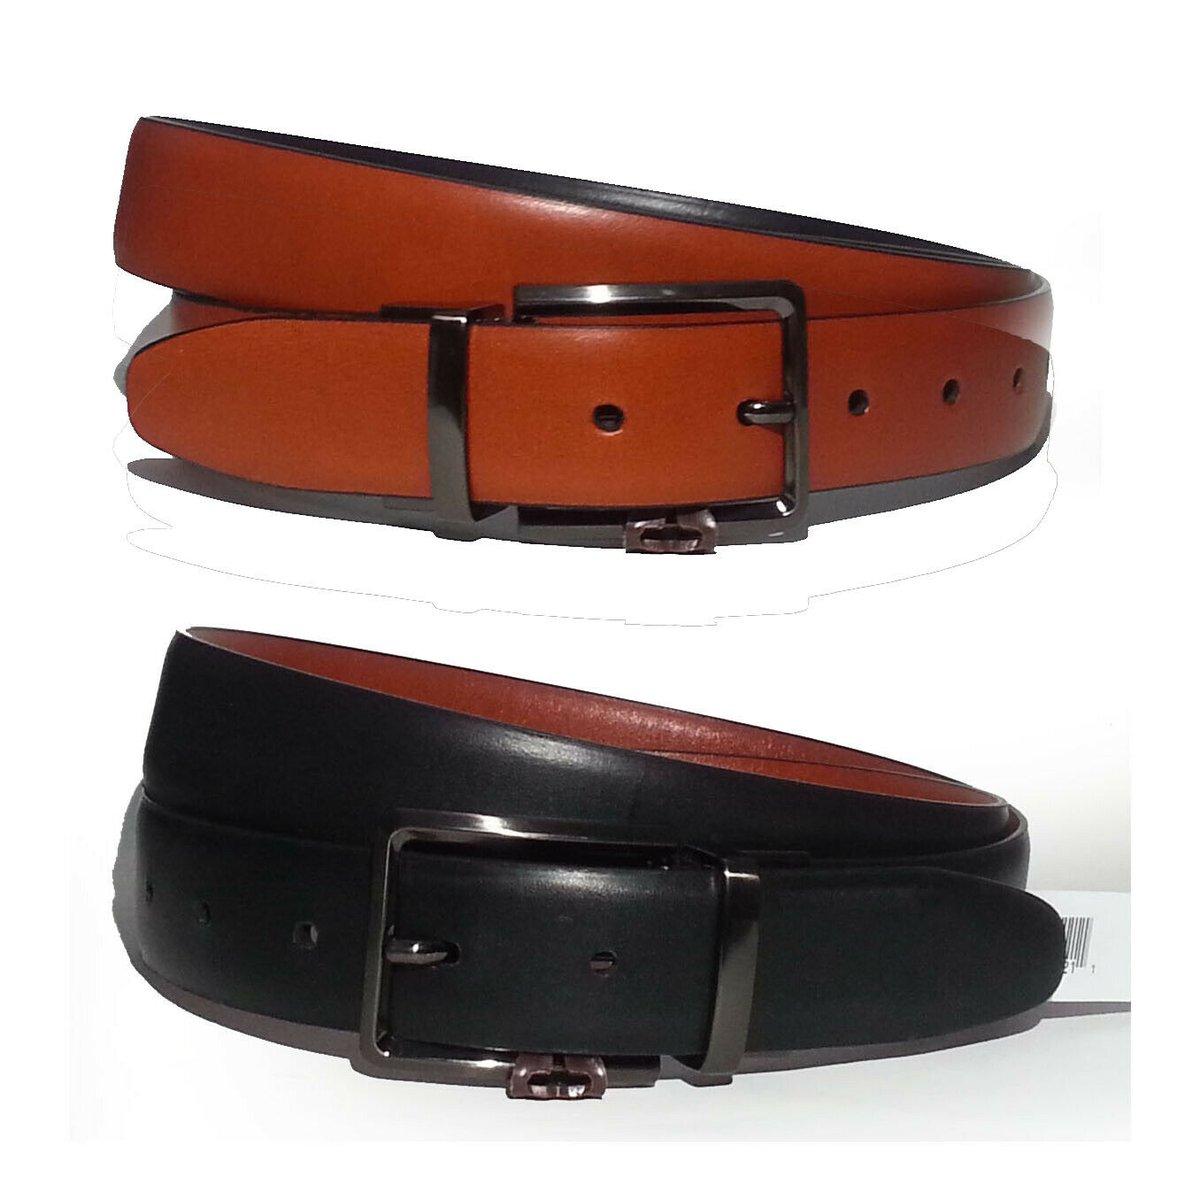 Sale $48.97 https://ebay.to/2R7NPBy Trafalgar Men #leather #belt Size 38 (36-42) 30mmpic.twitter.com/sQ8ZZ4Arzh